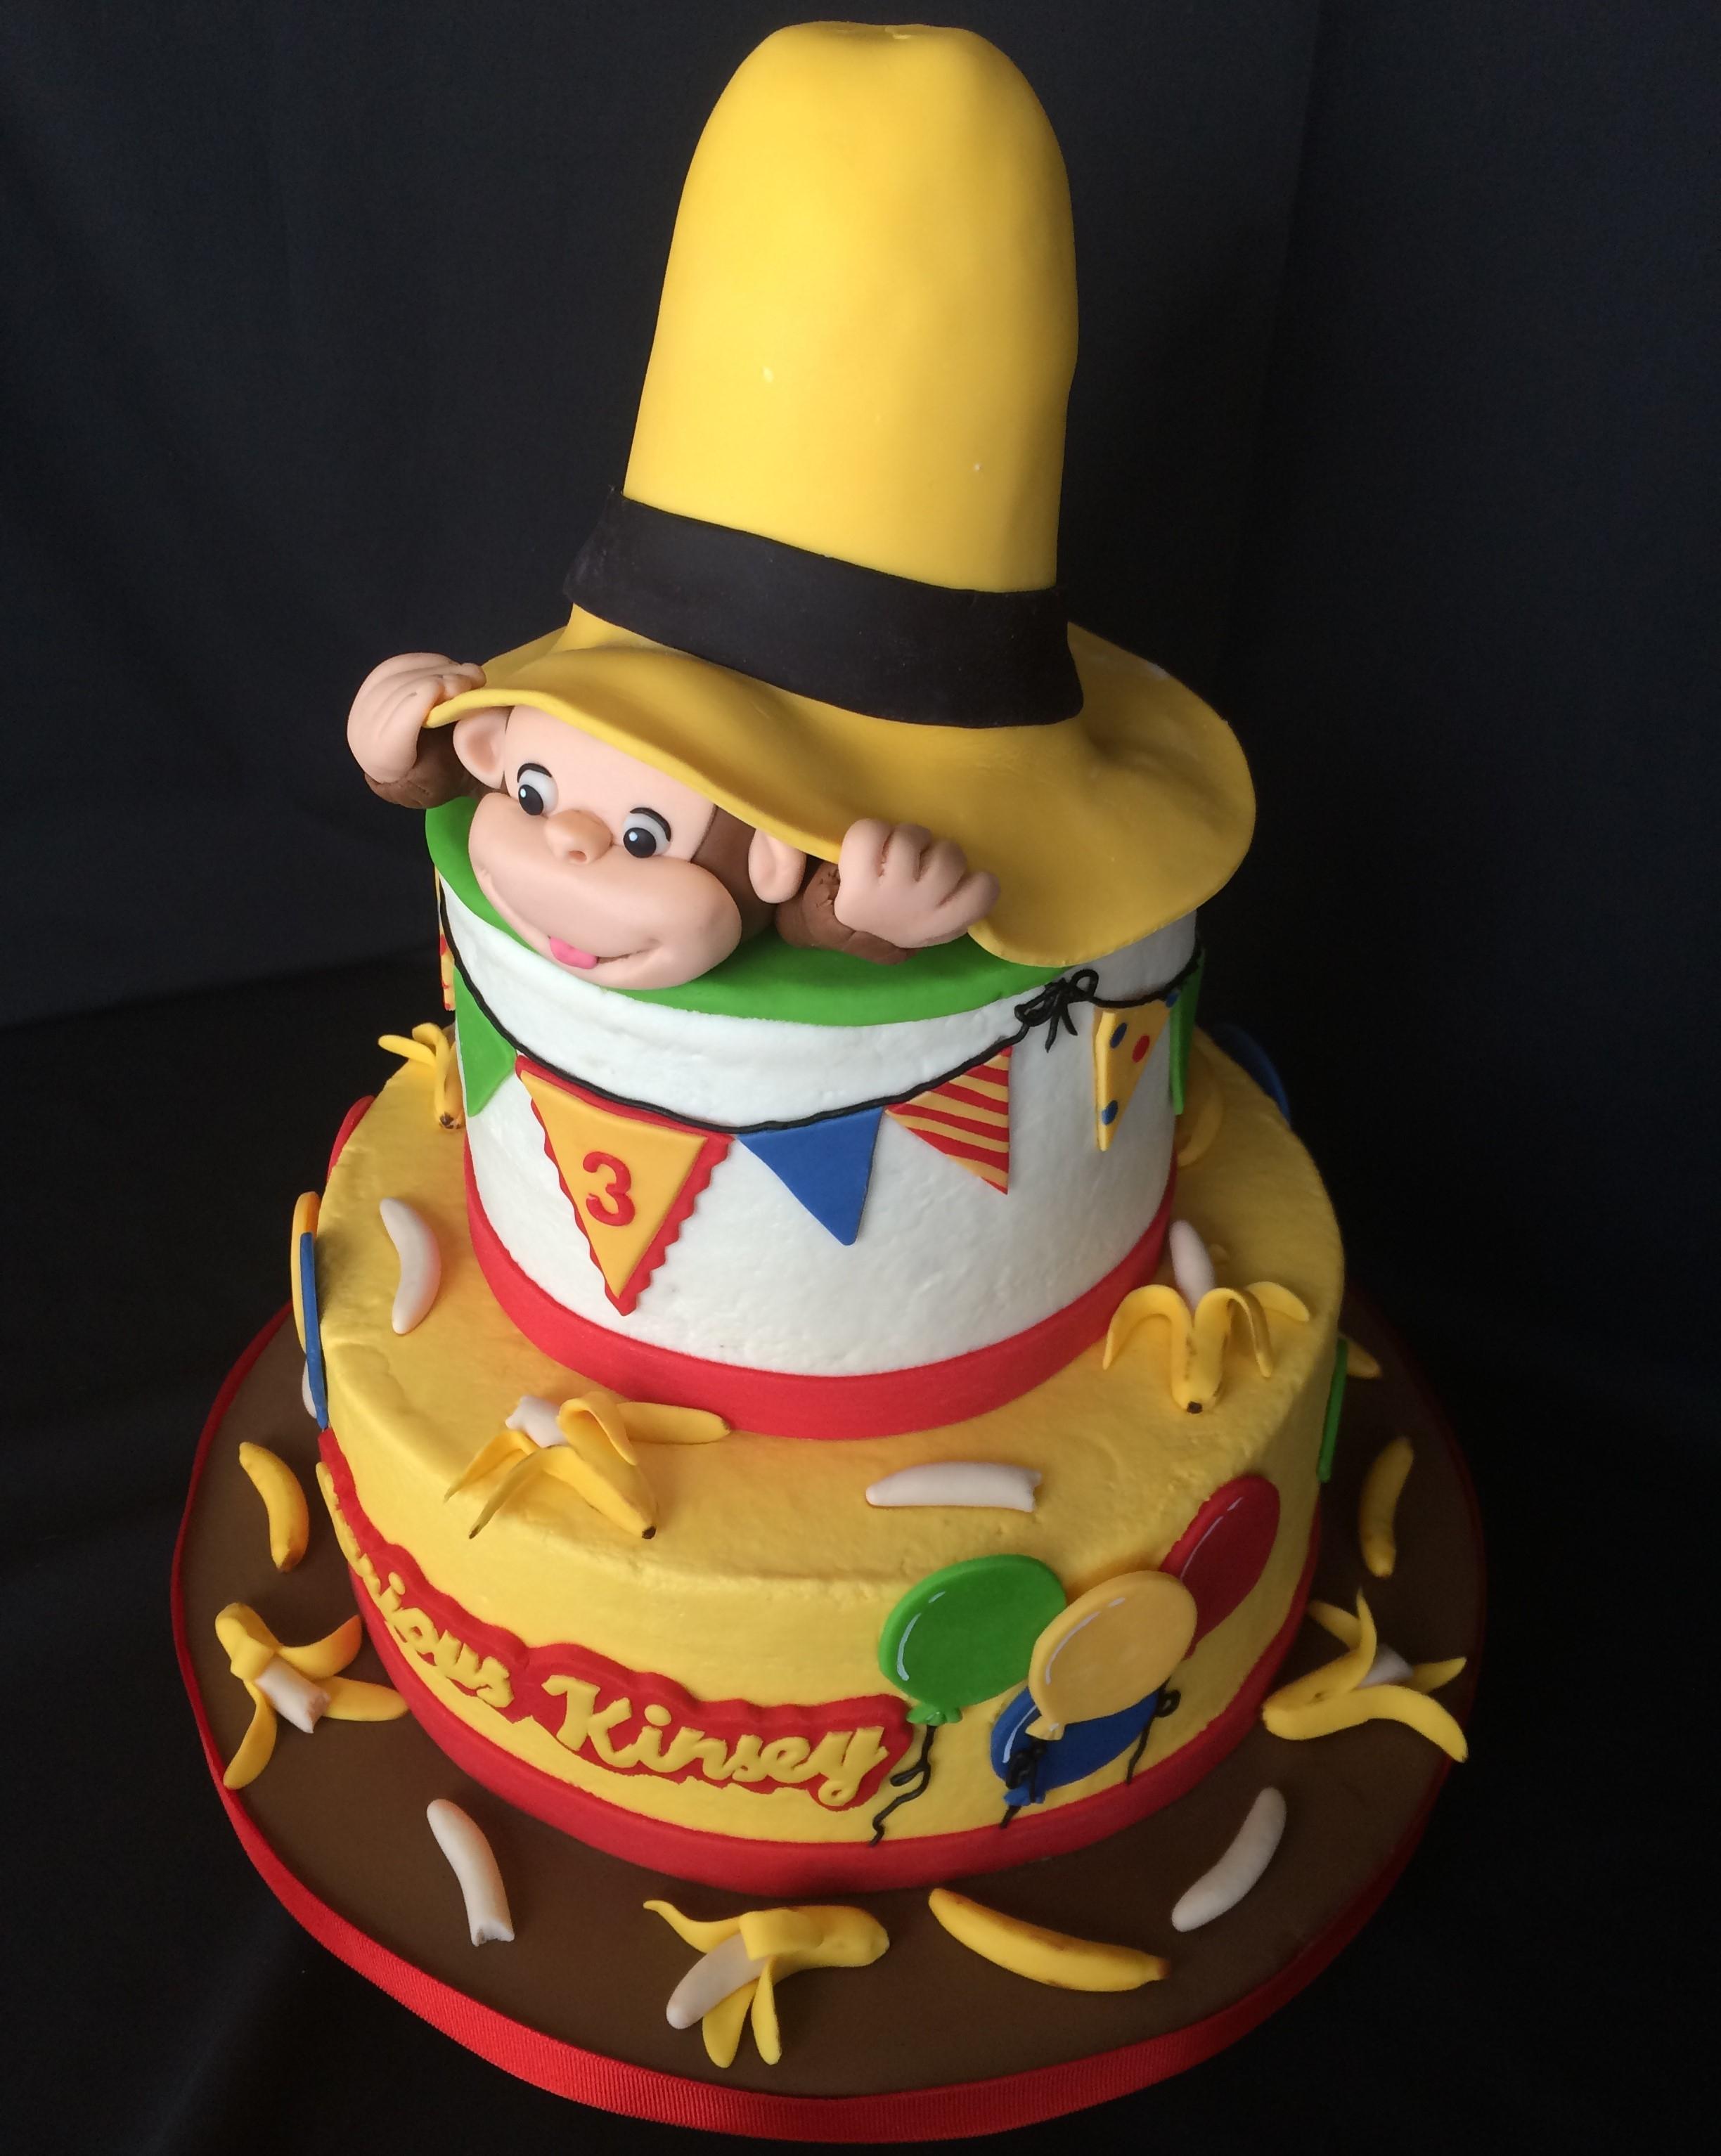 Decorating Buttercream Cake With Fondant